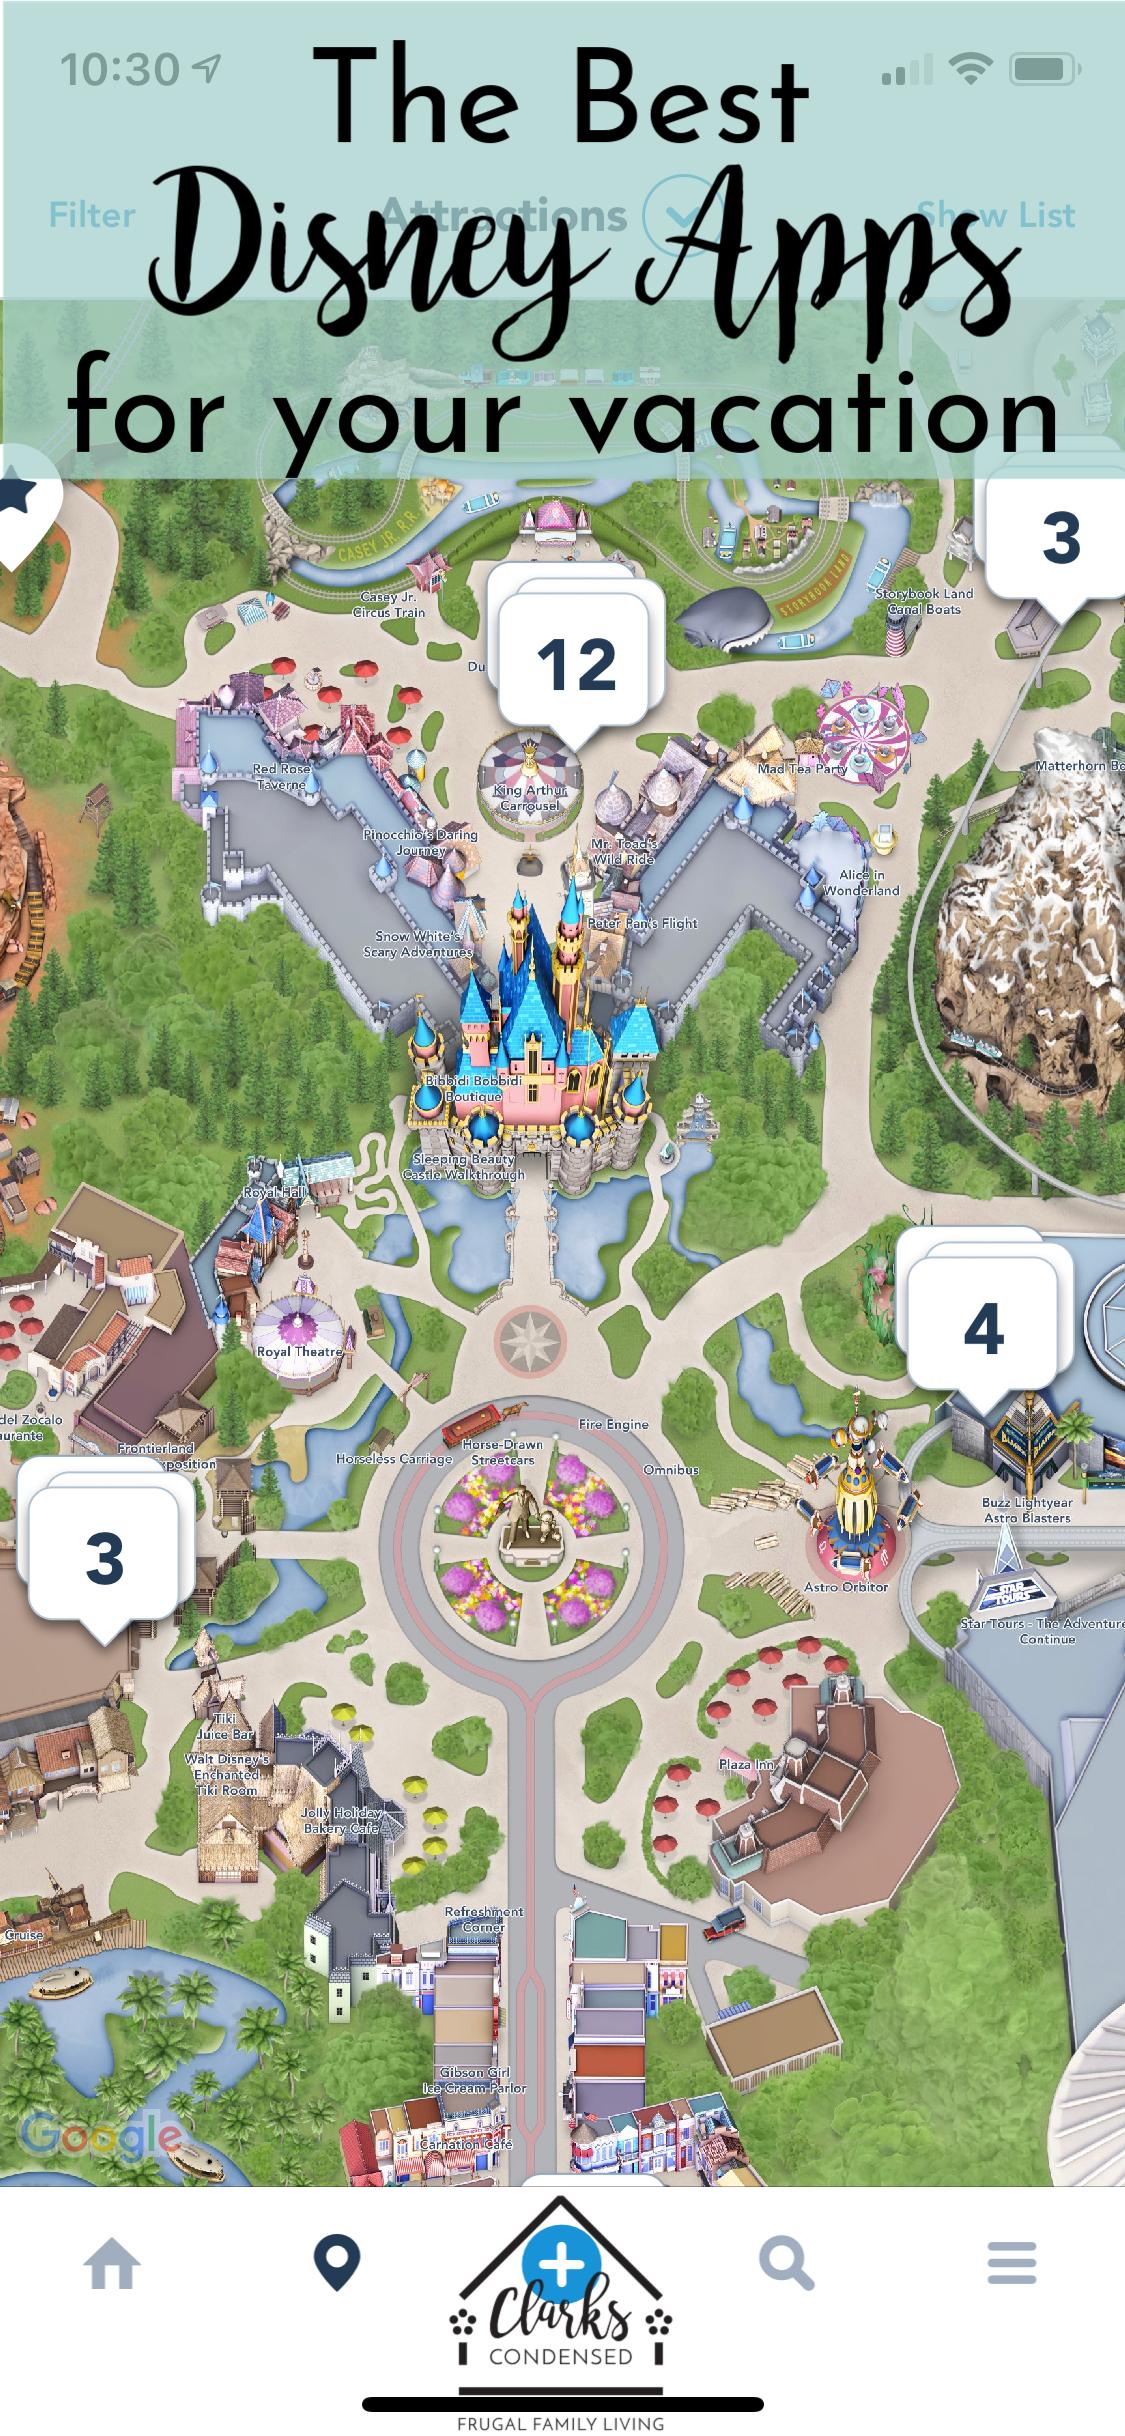 Best Apps for Disney World and Disneyland | Disney world ... Disneyland Map App on disney world map app, disneyland street map, six flags map app,